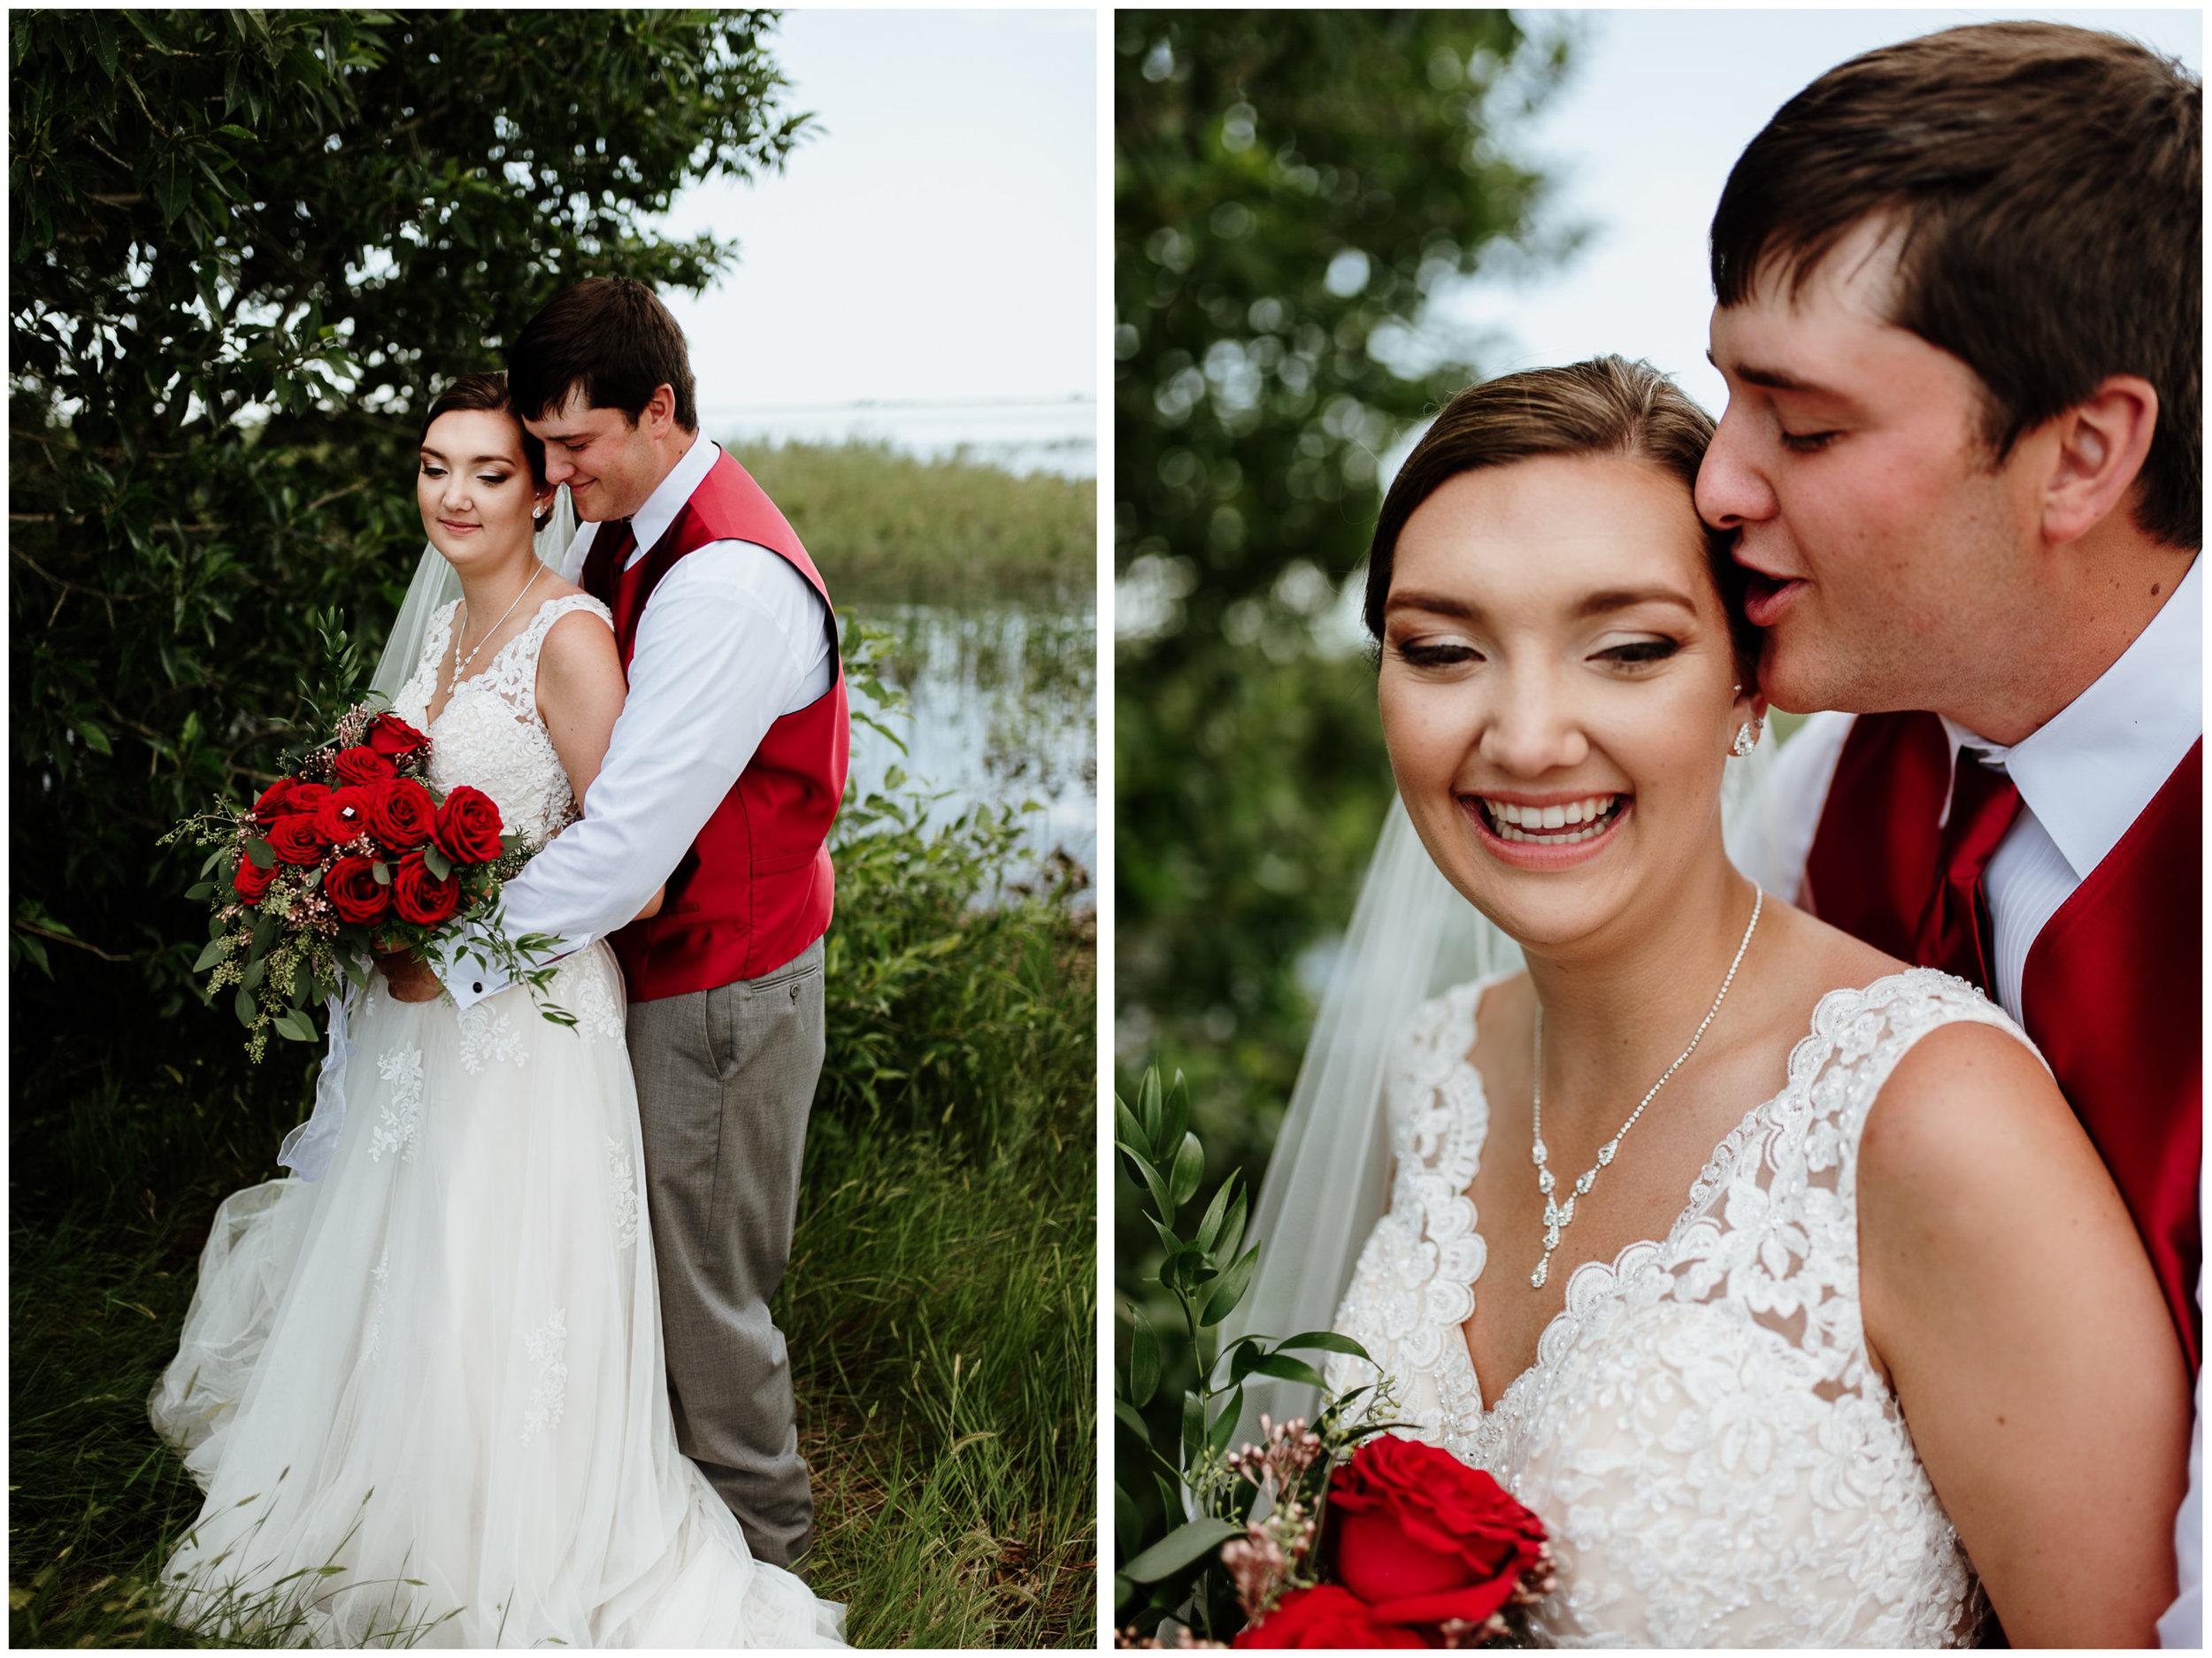 malia_clint_valier_rural_wedding_p20.jpg